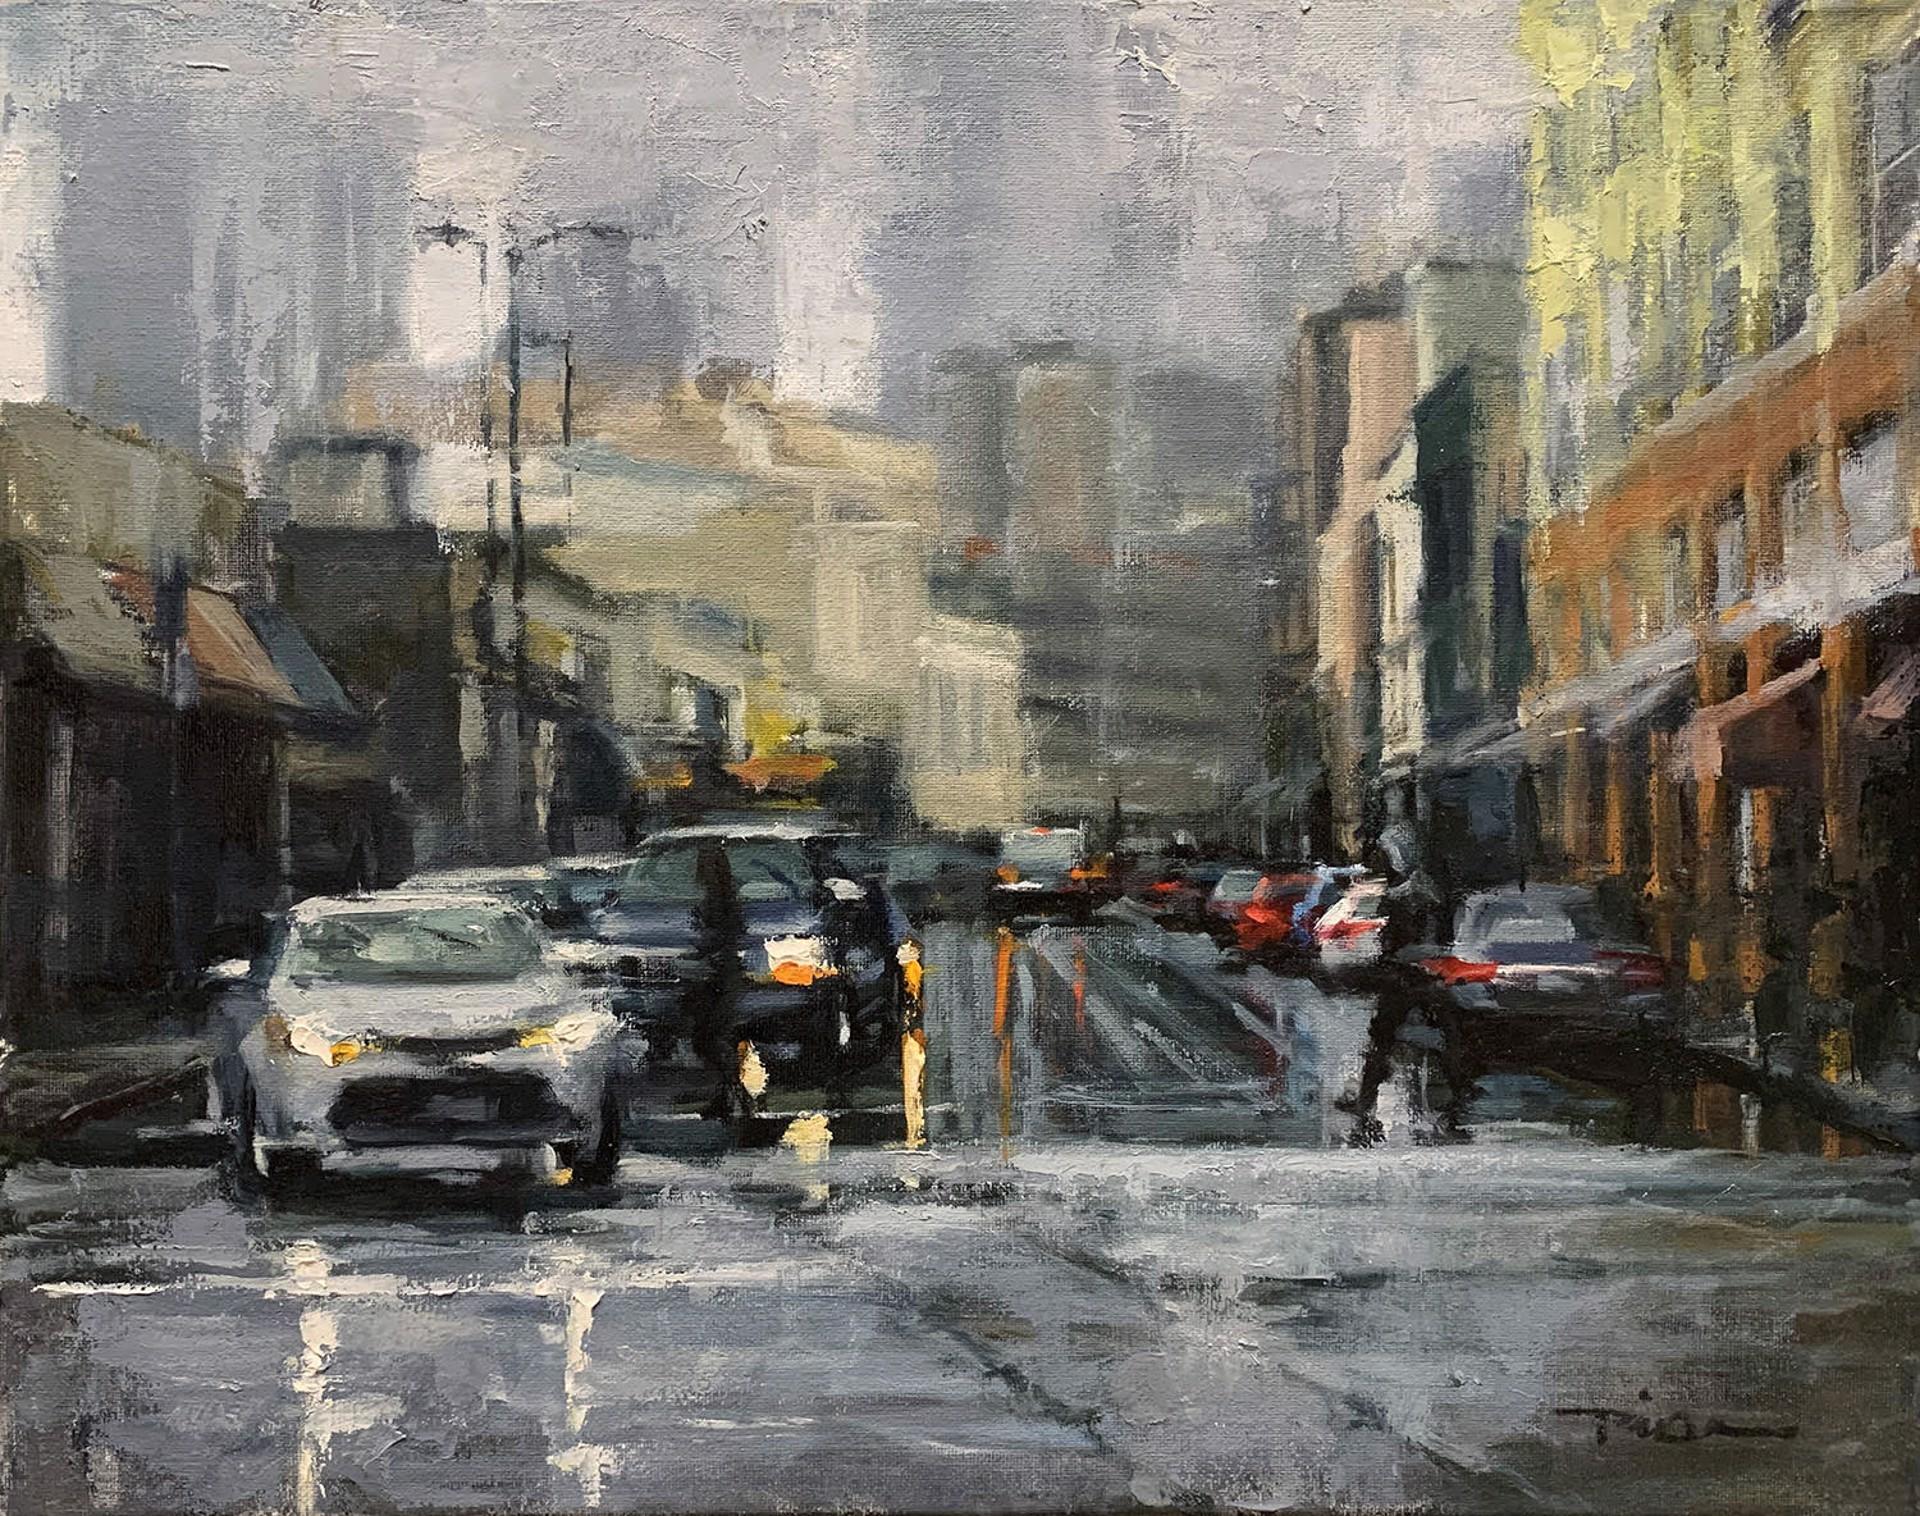 Downtown Rain by Pil Ho Lee